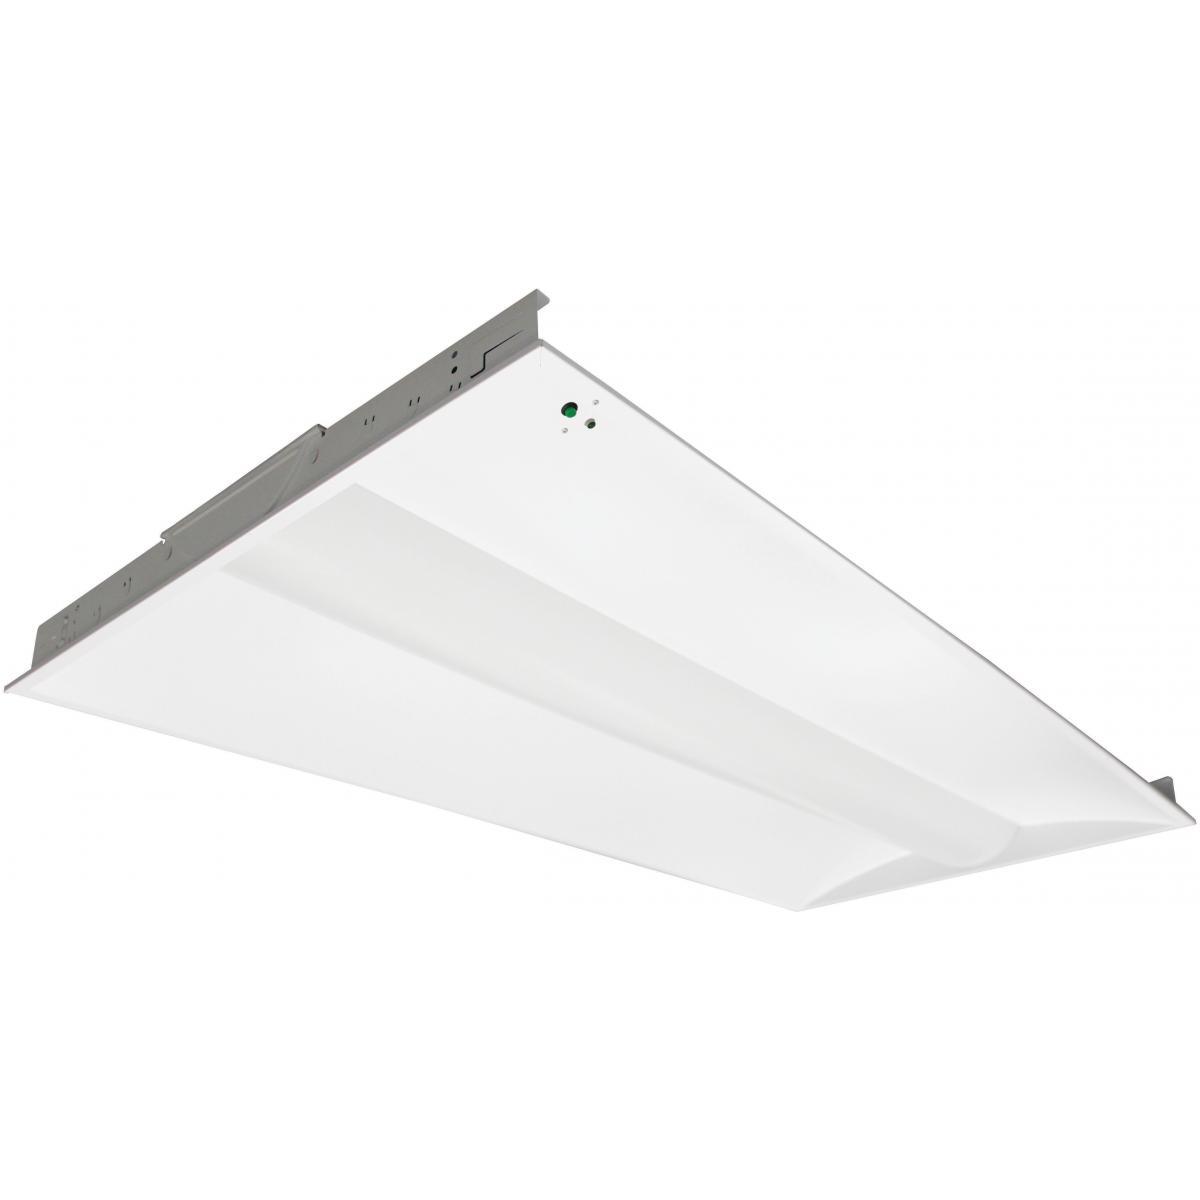 65-455 2FT X 4FT EM LED TROFFER 50W